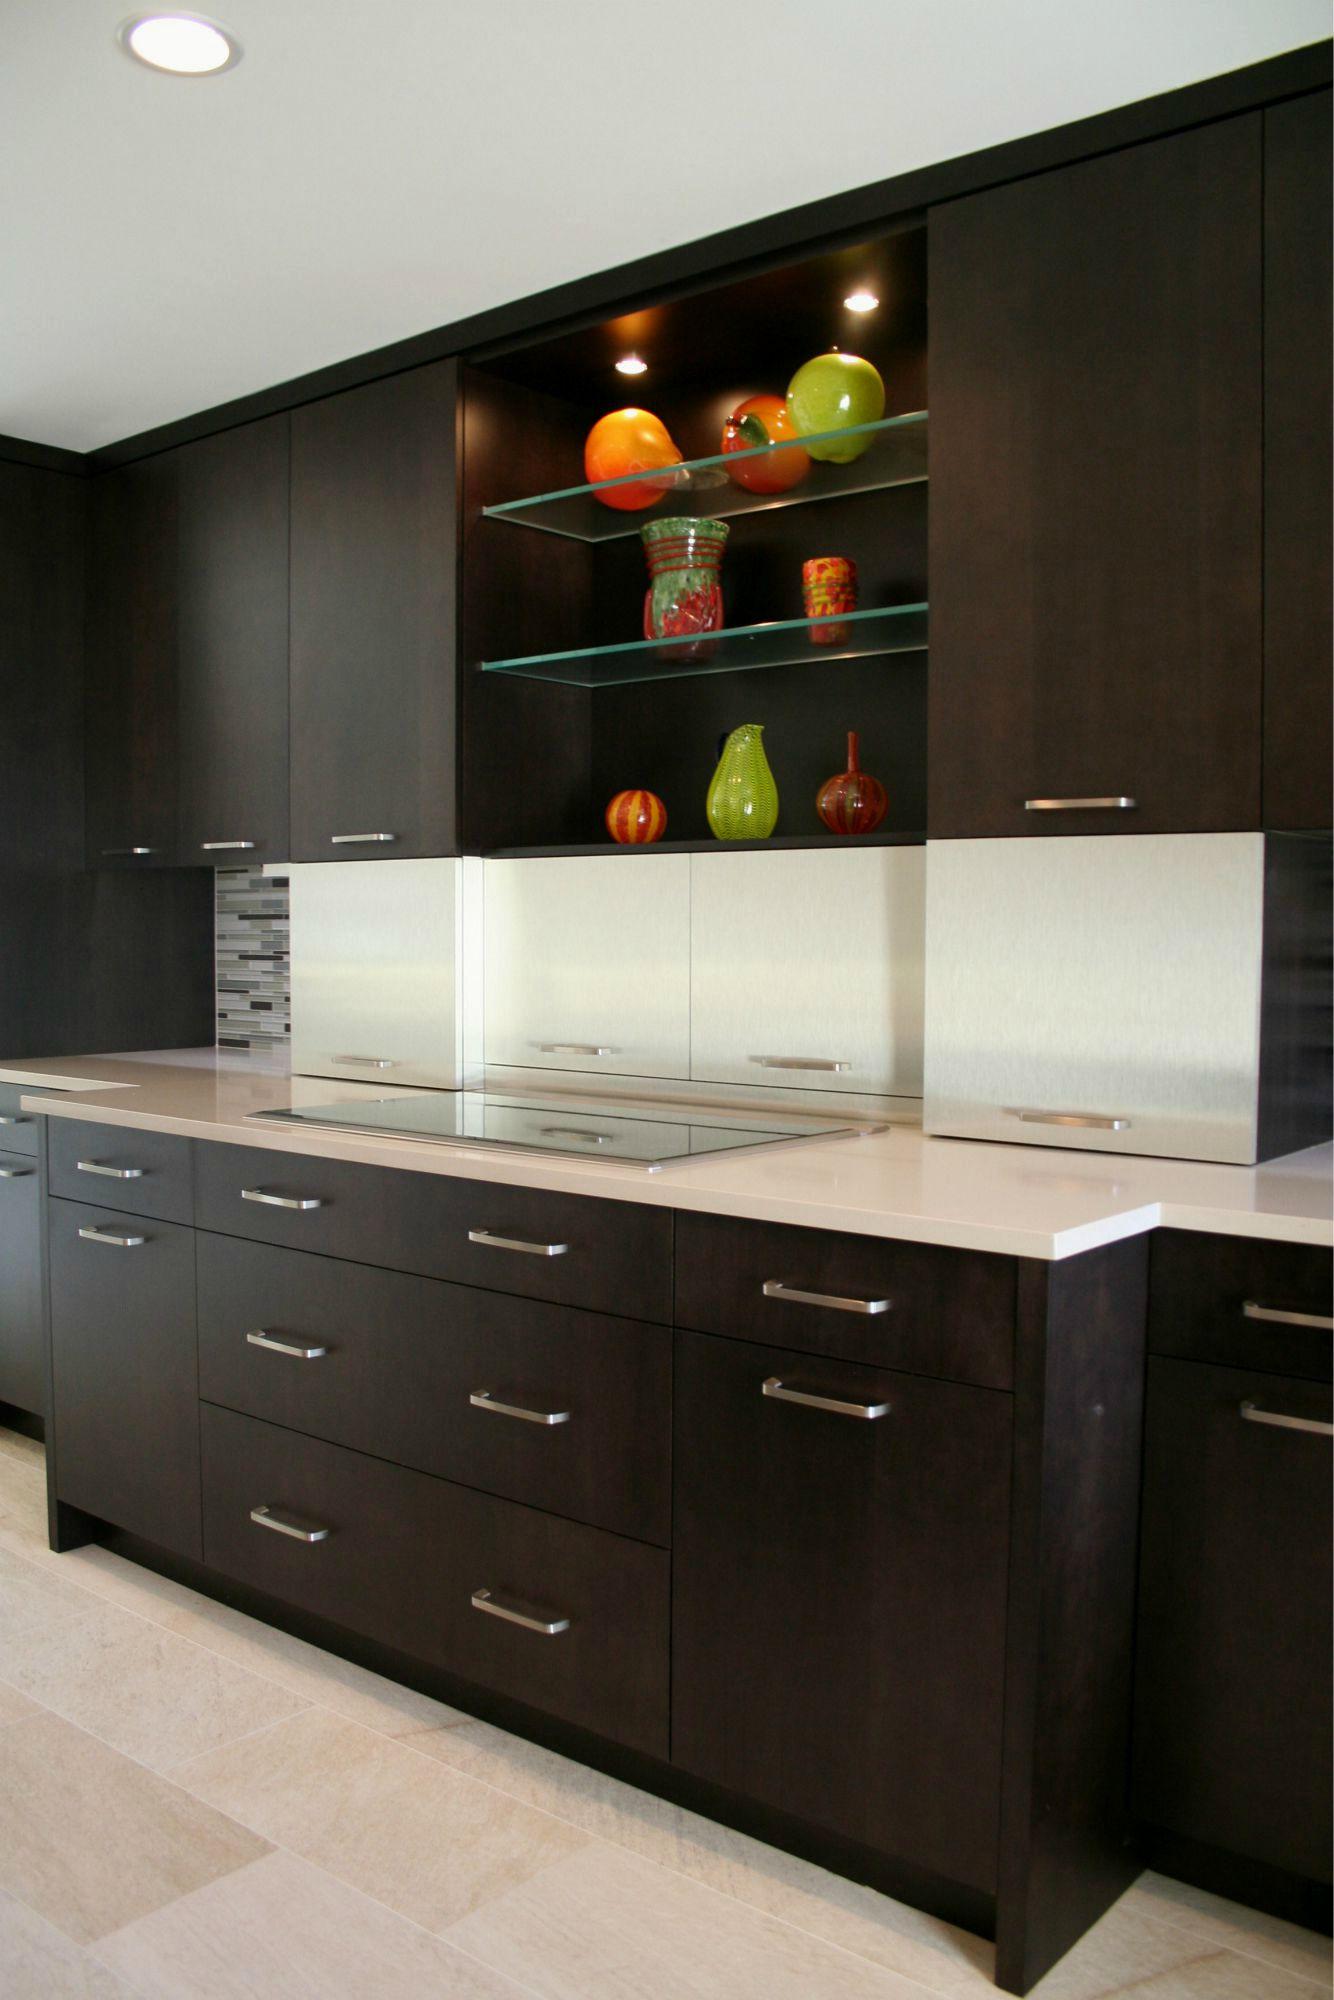 Bkc kitchen bath basement bar portfolio for Kitchen and bathroom cabinets